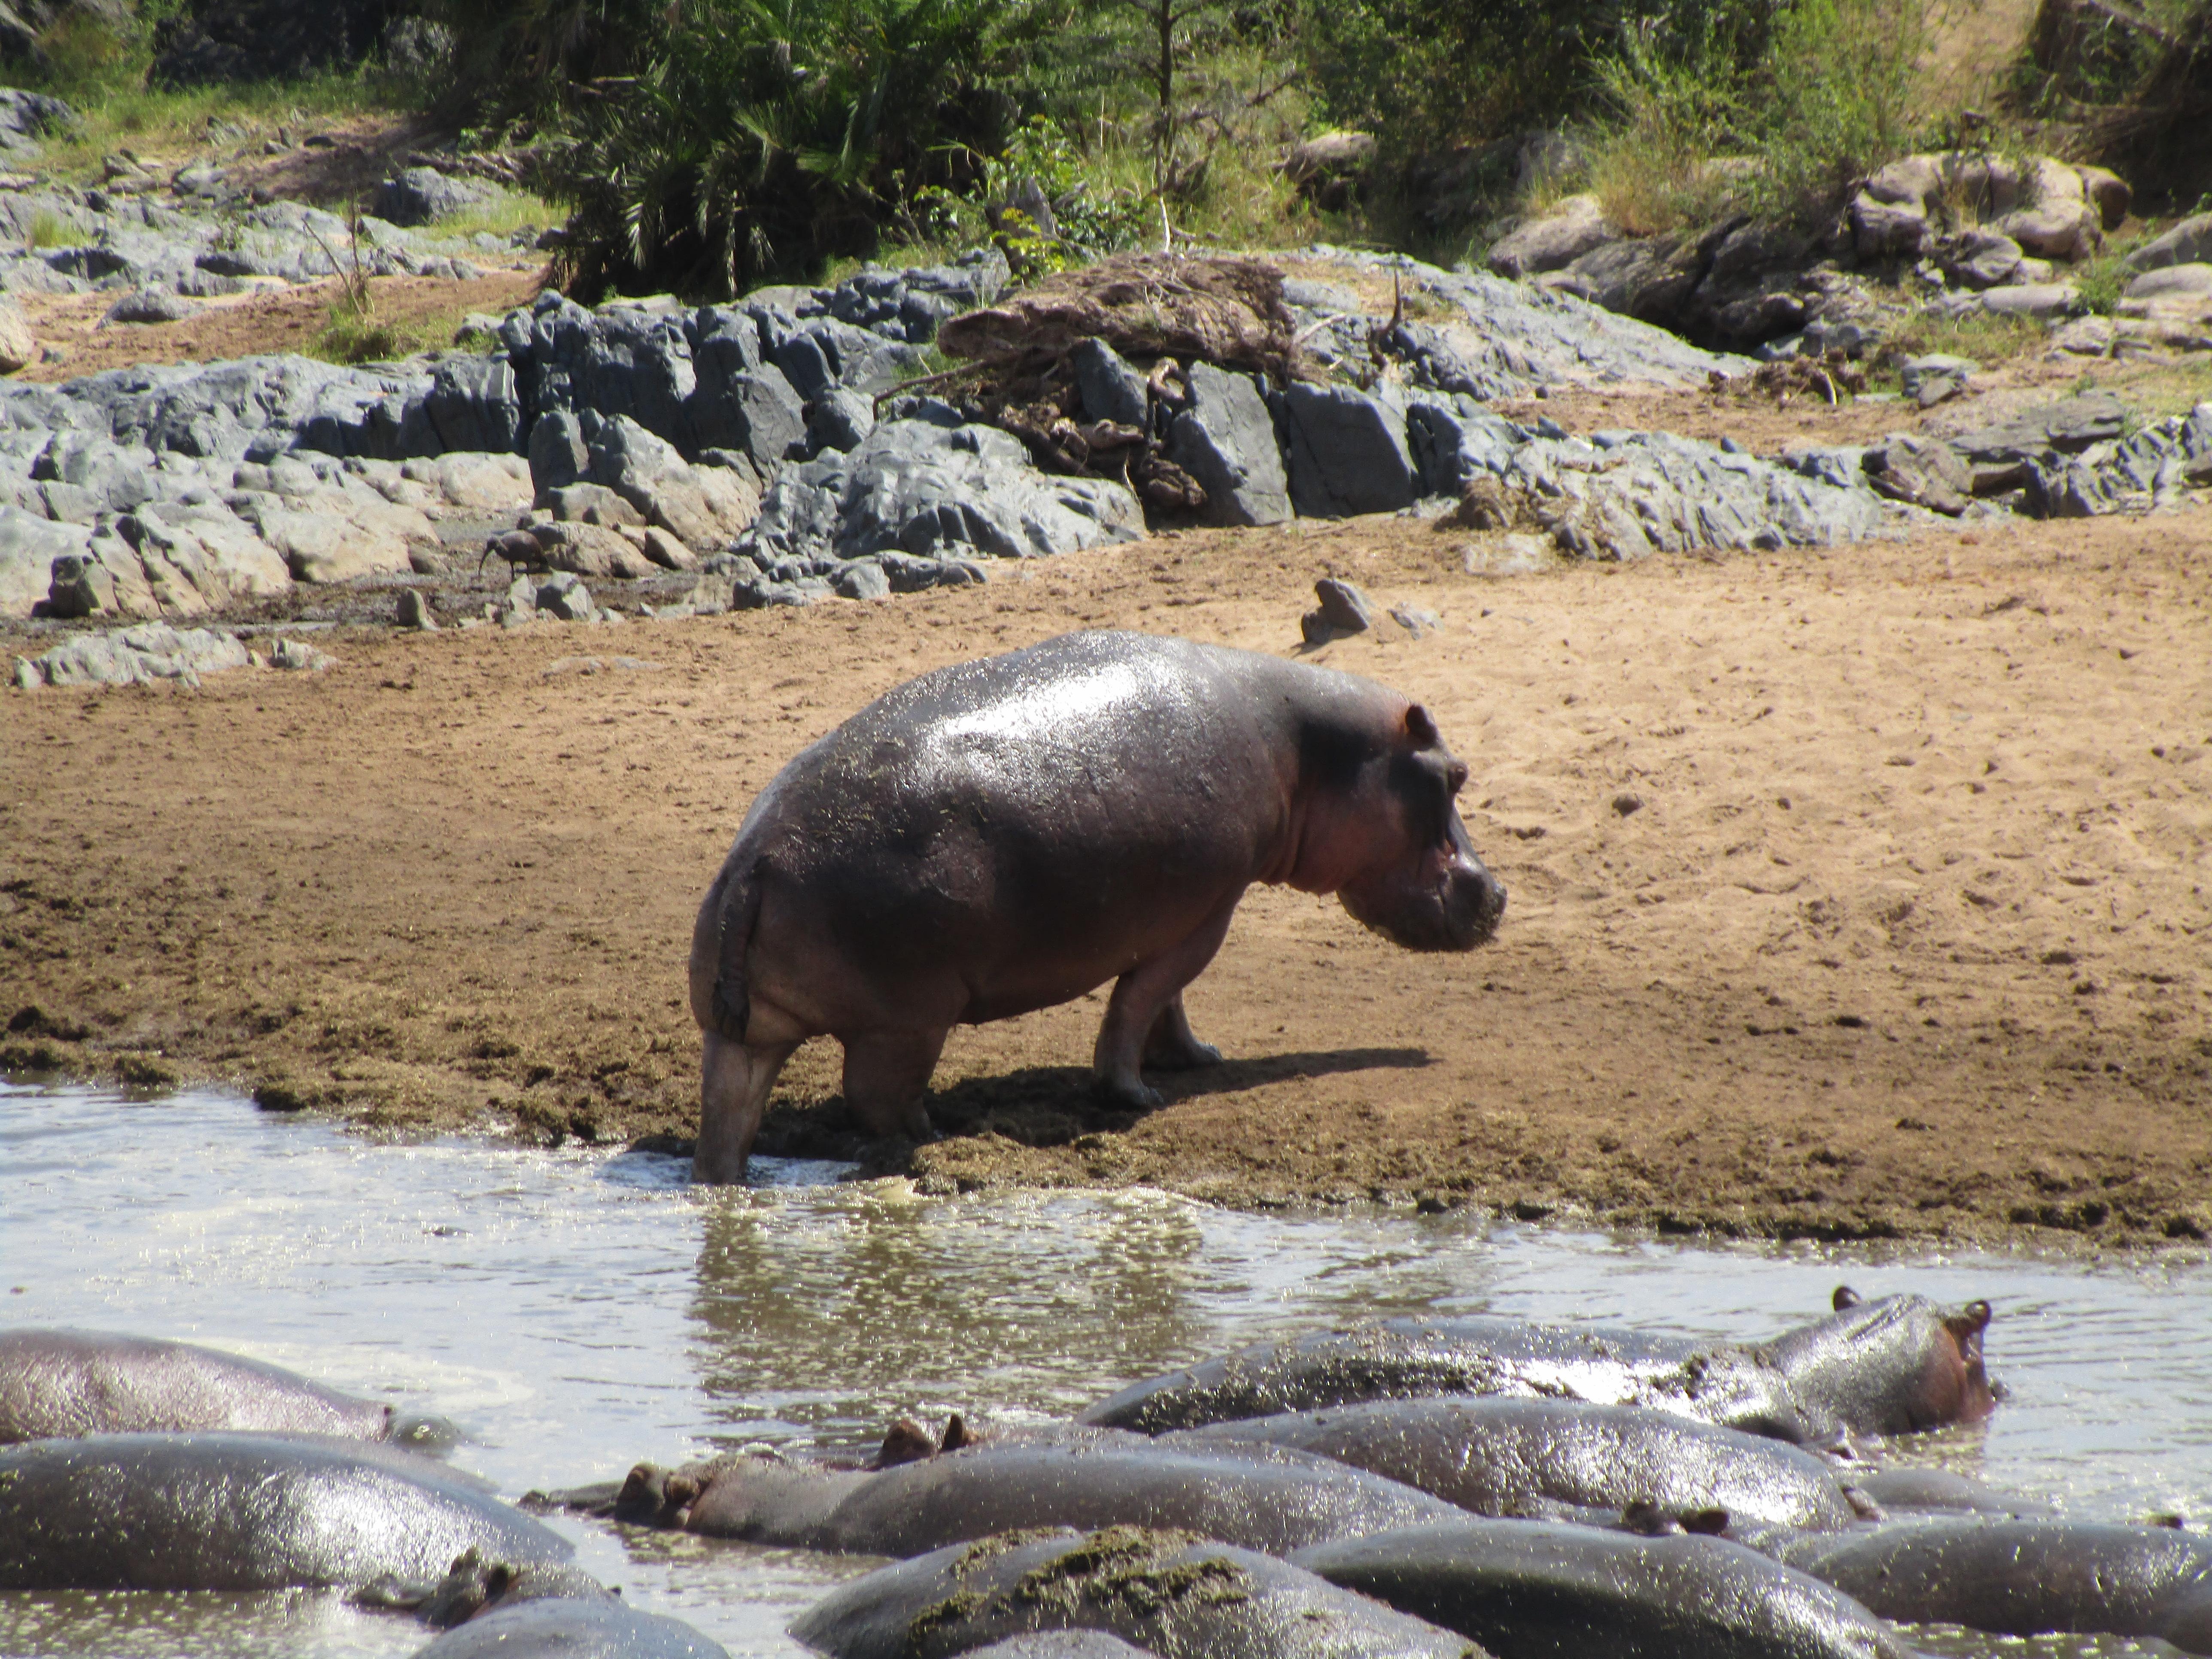 Hippo Serengeti National Park